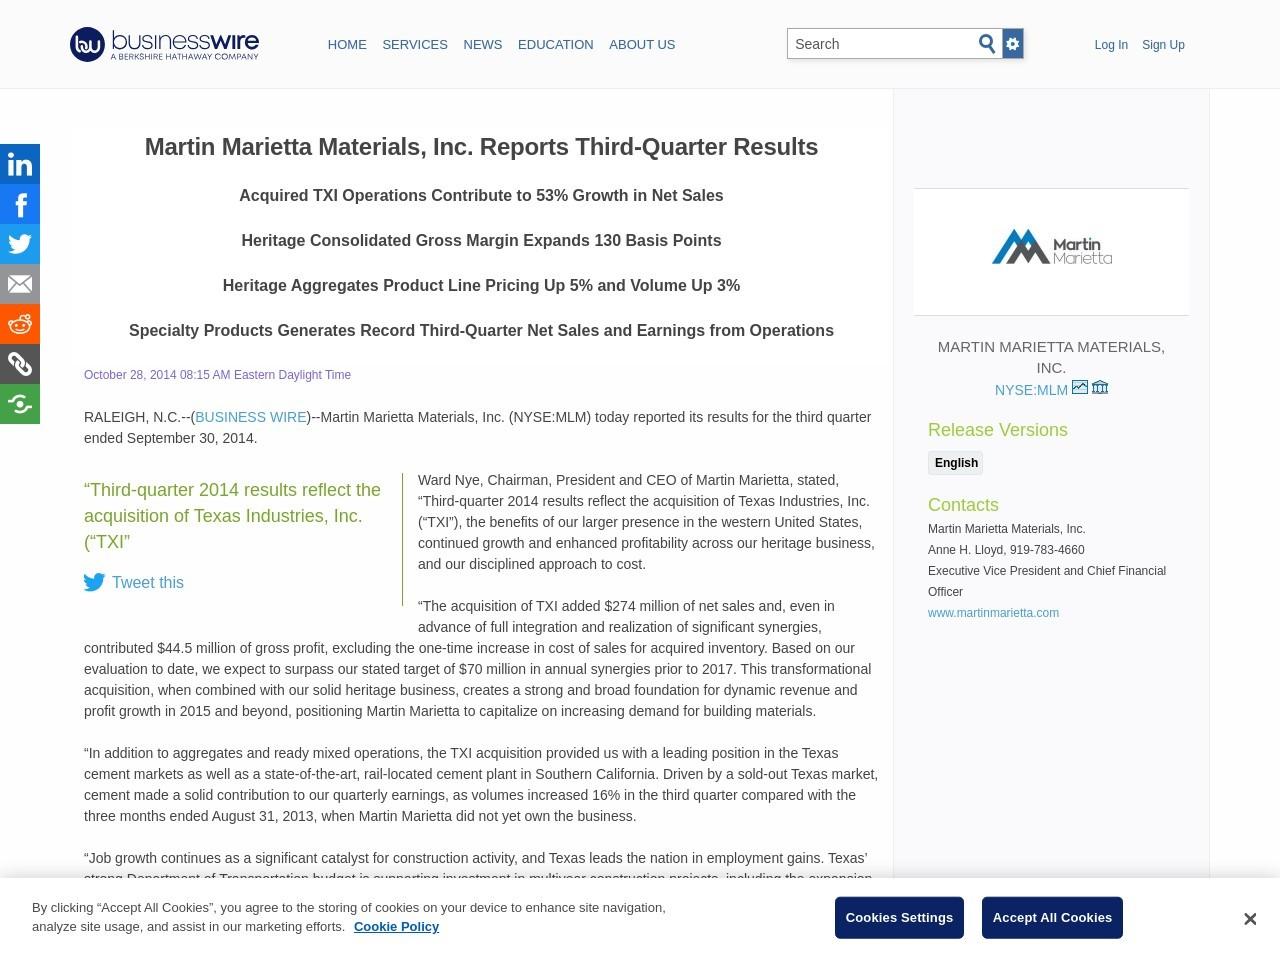 Martin Marietta Materials, Inc. Reports Third-Quarter Results